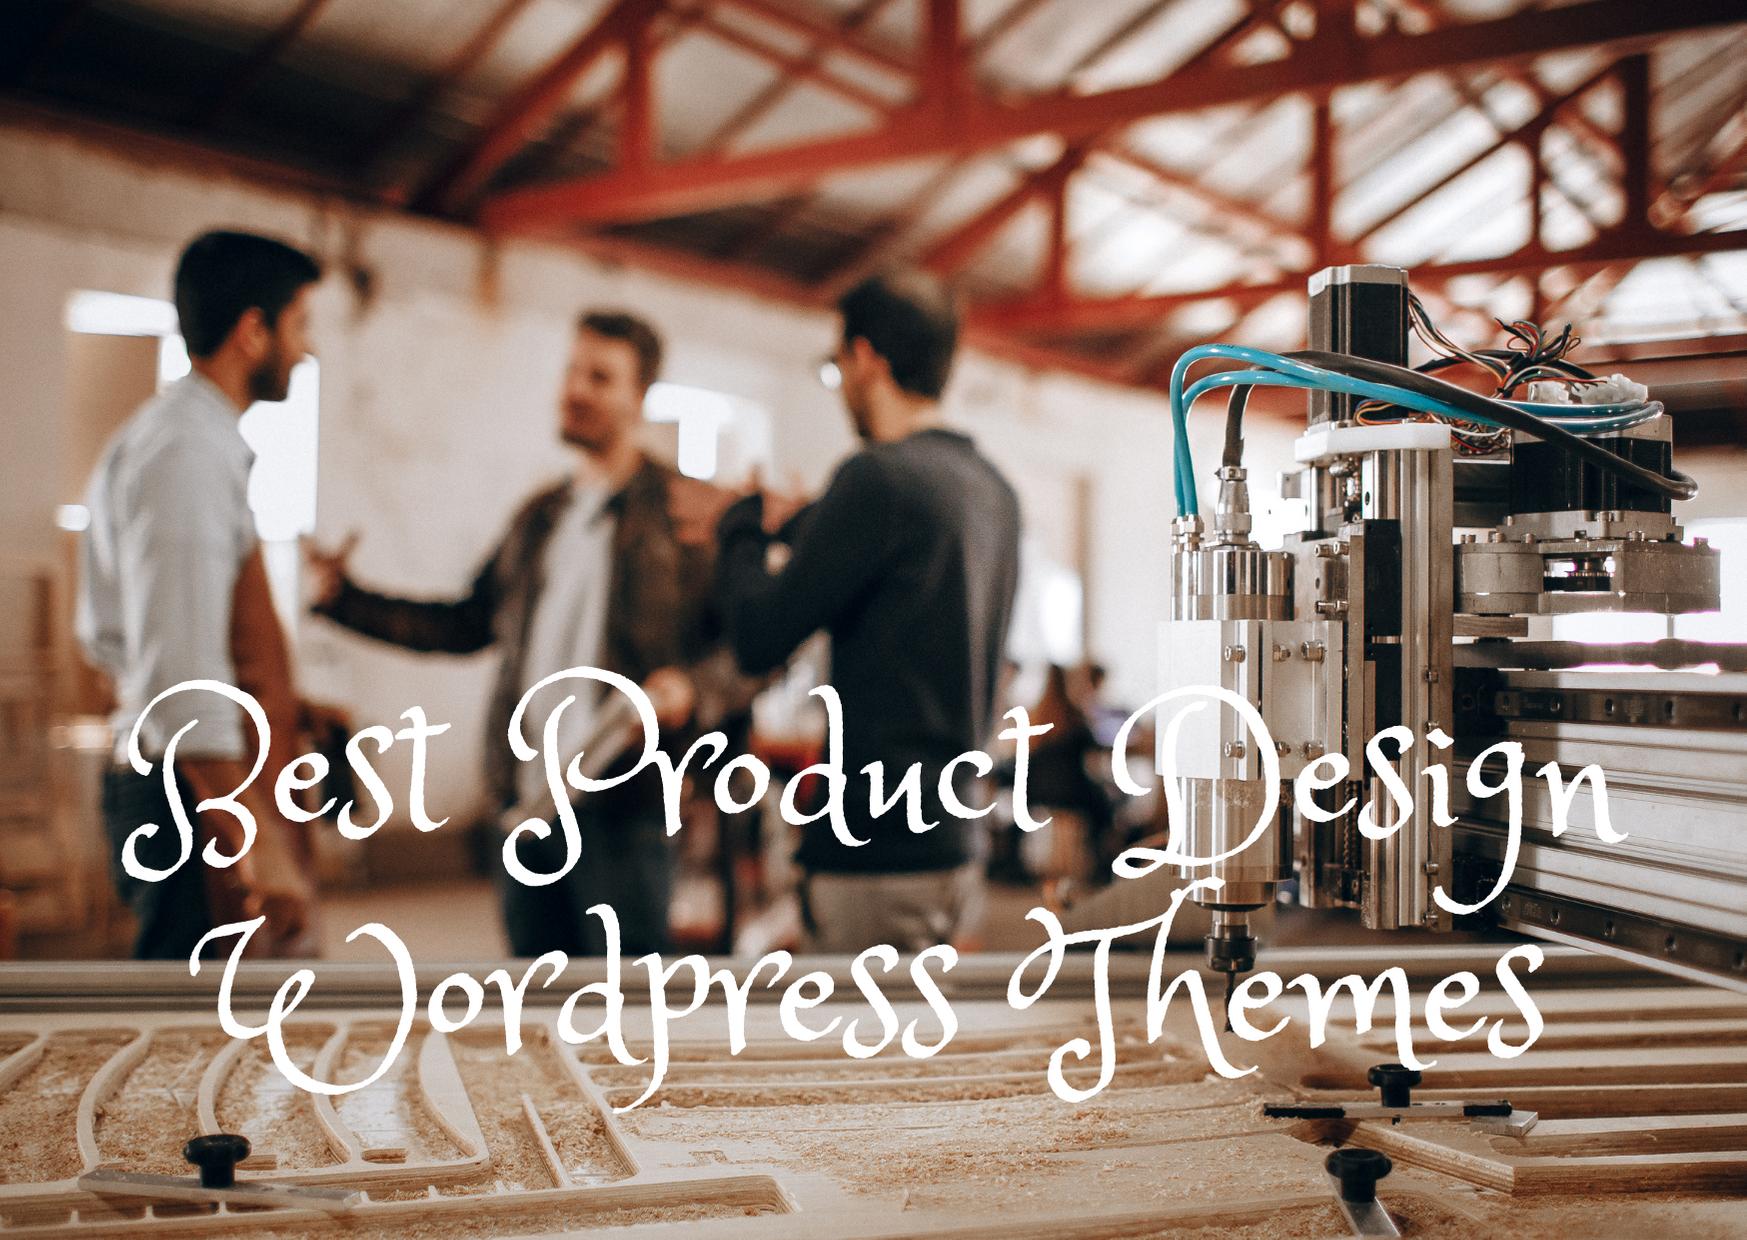 best product design wp theme